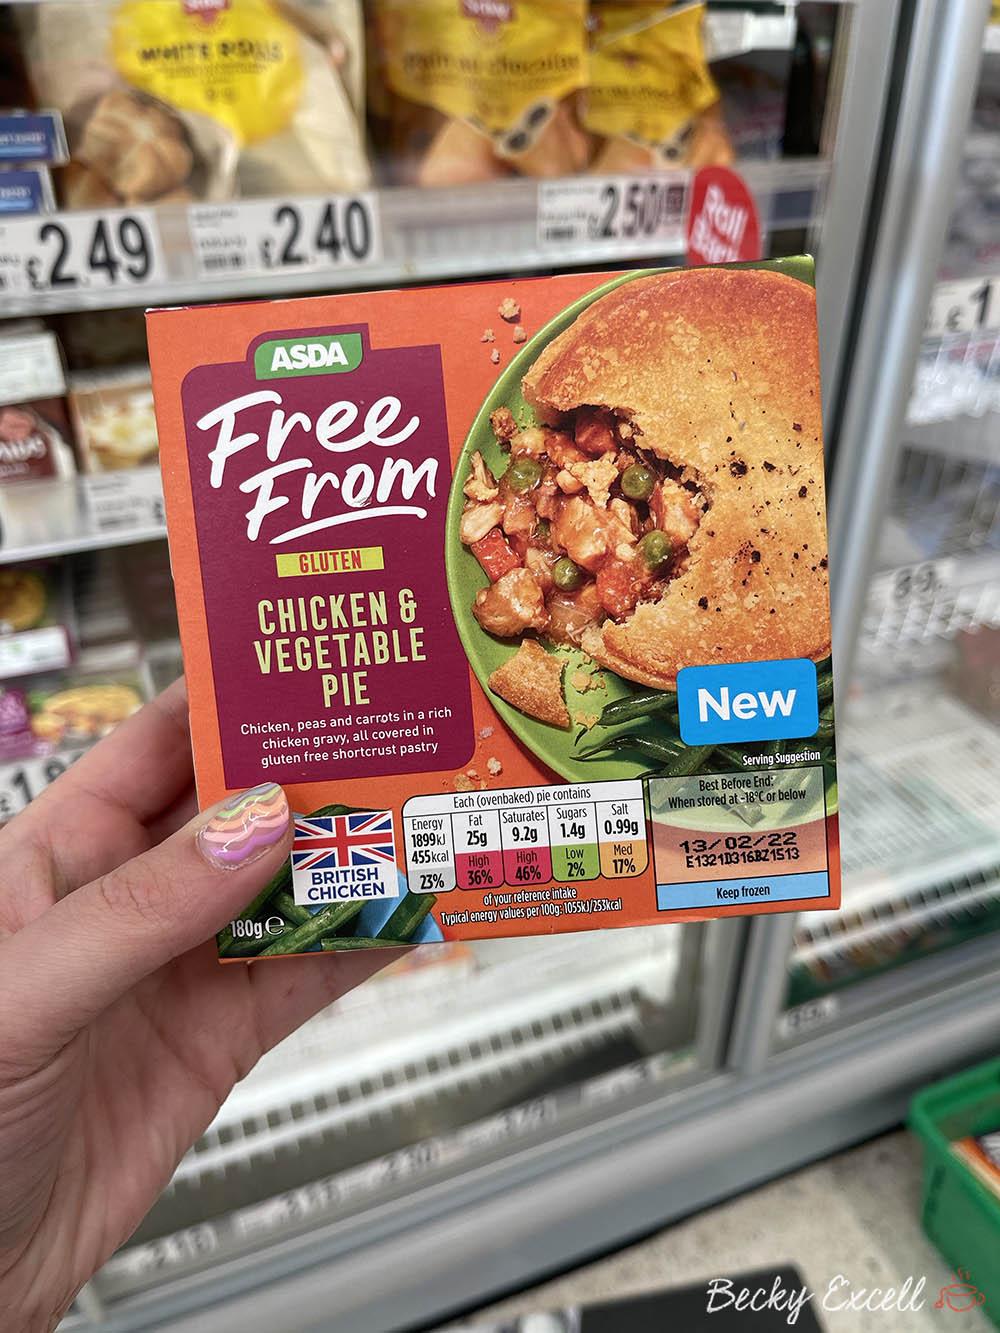 15 NEW products in Asda's gluten-free range 2021